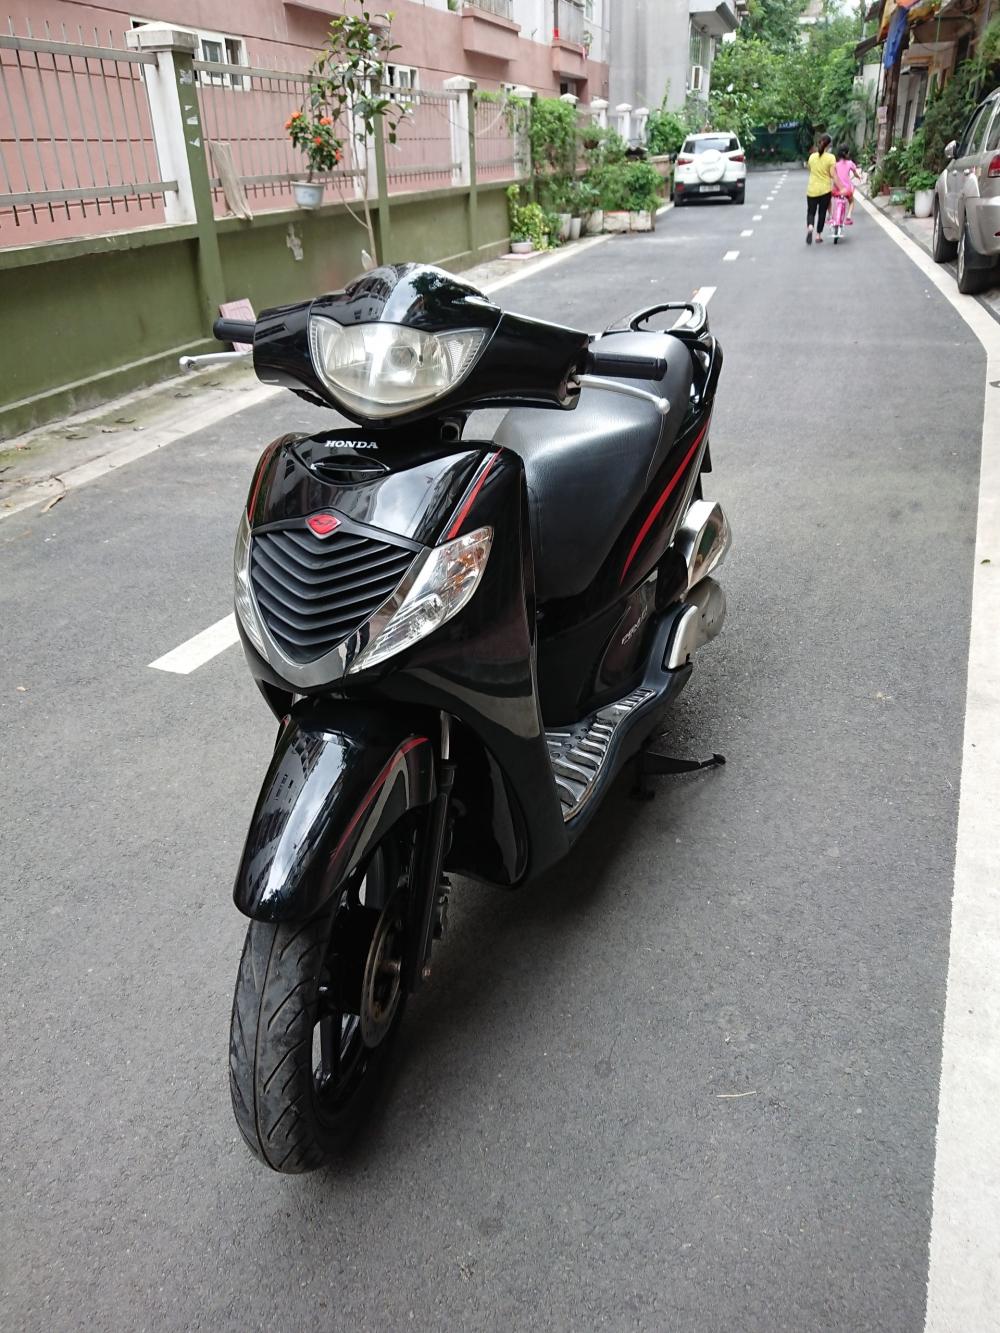 Rao ban Honda Sh 150i Black Sport 2009 bien HN nguyen ban 59tr - 6